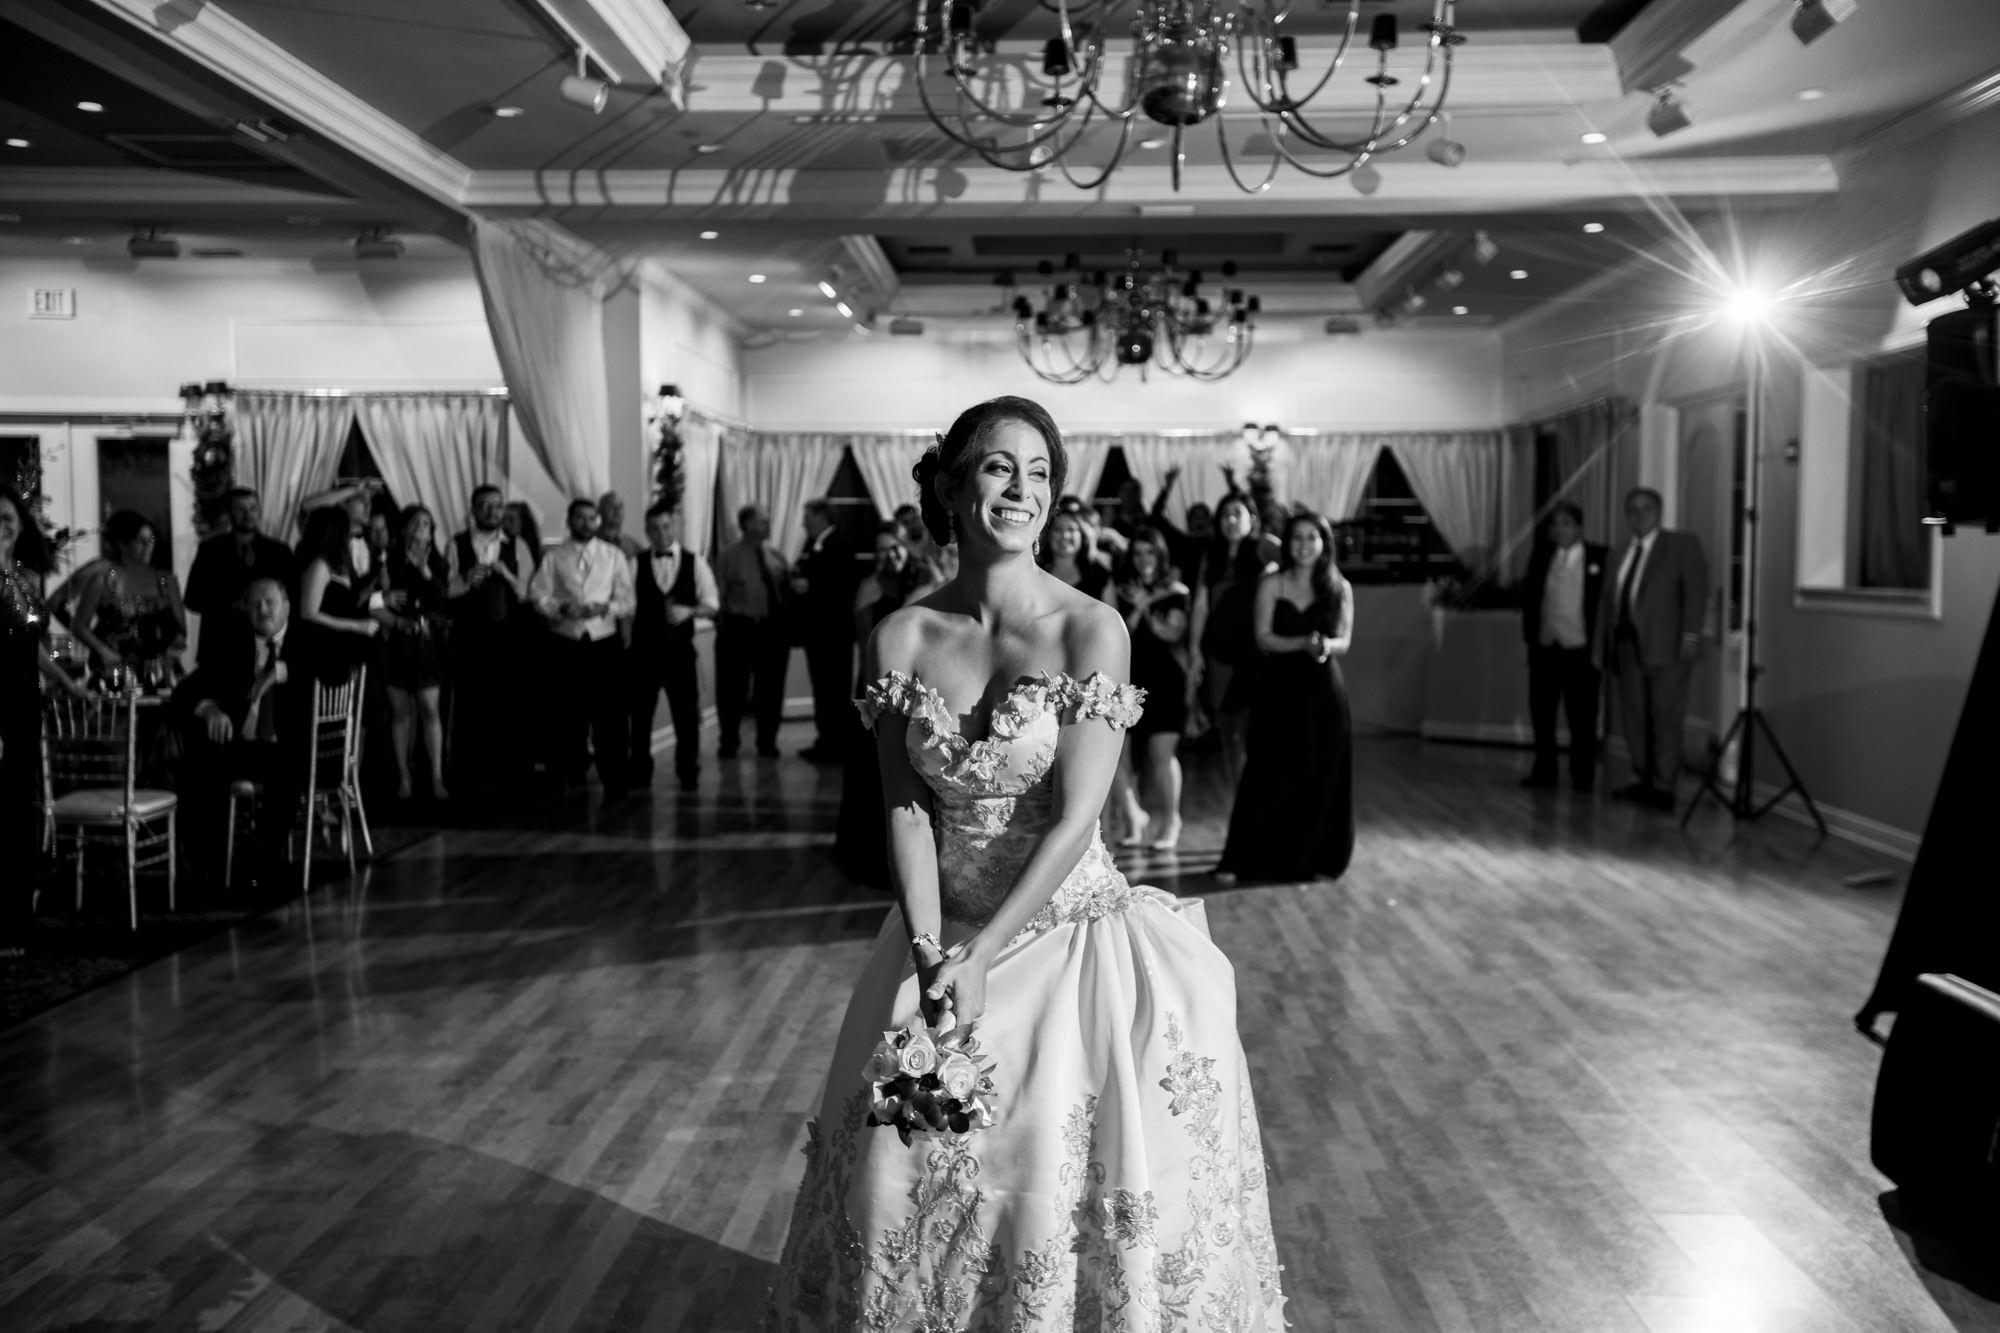 Benvenuto_Wedding_catholic_Florida_Bride-Groom-142.jpg